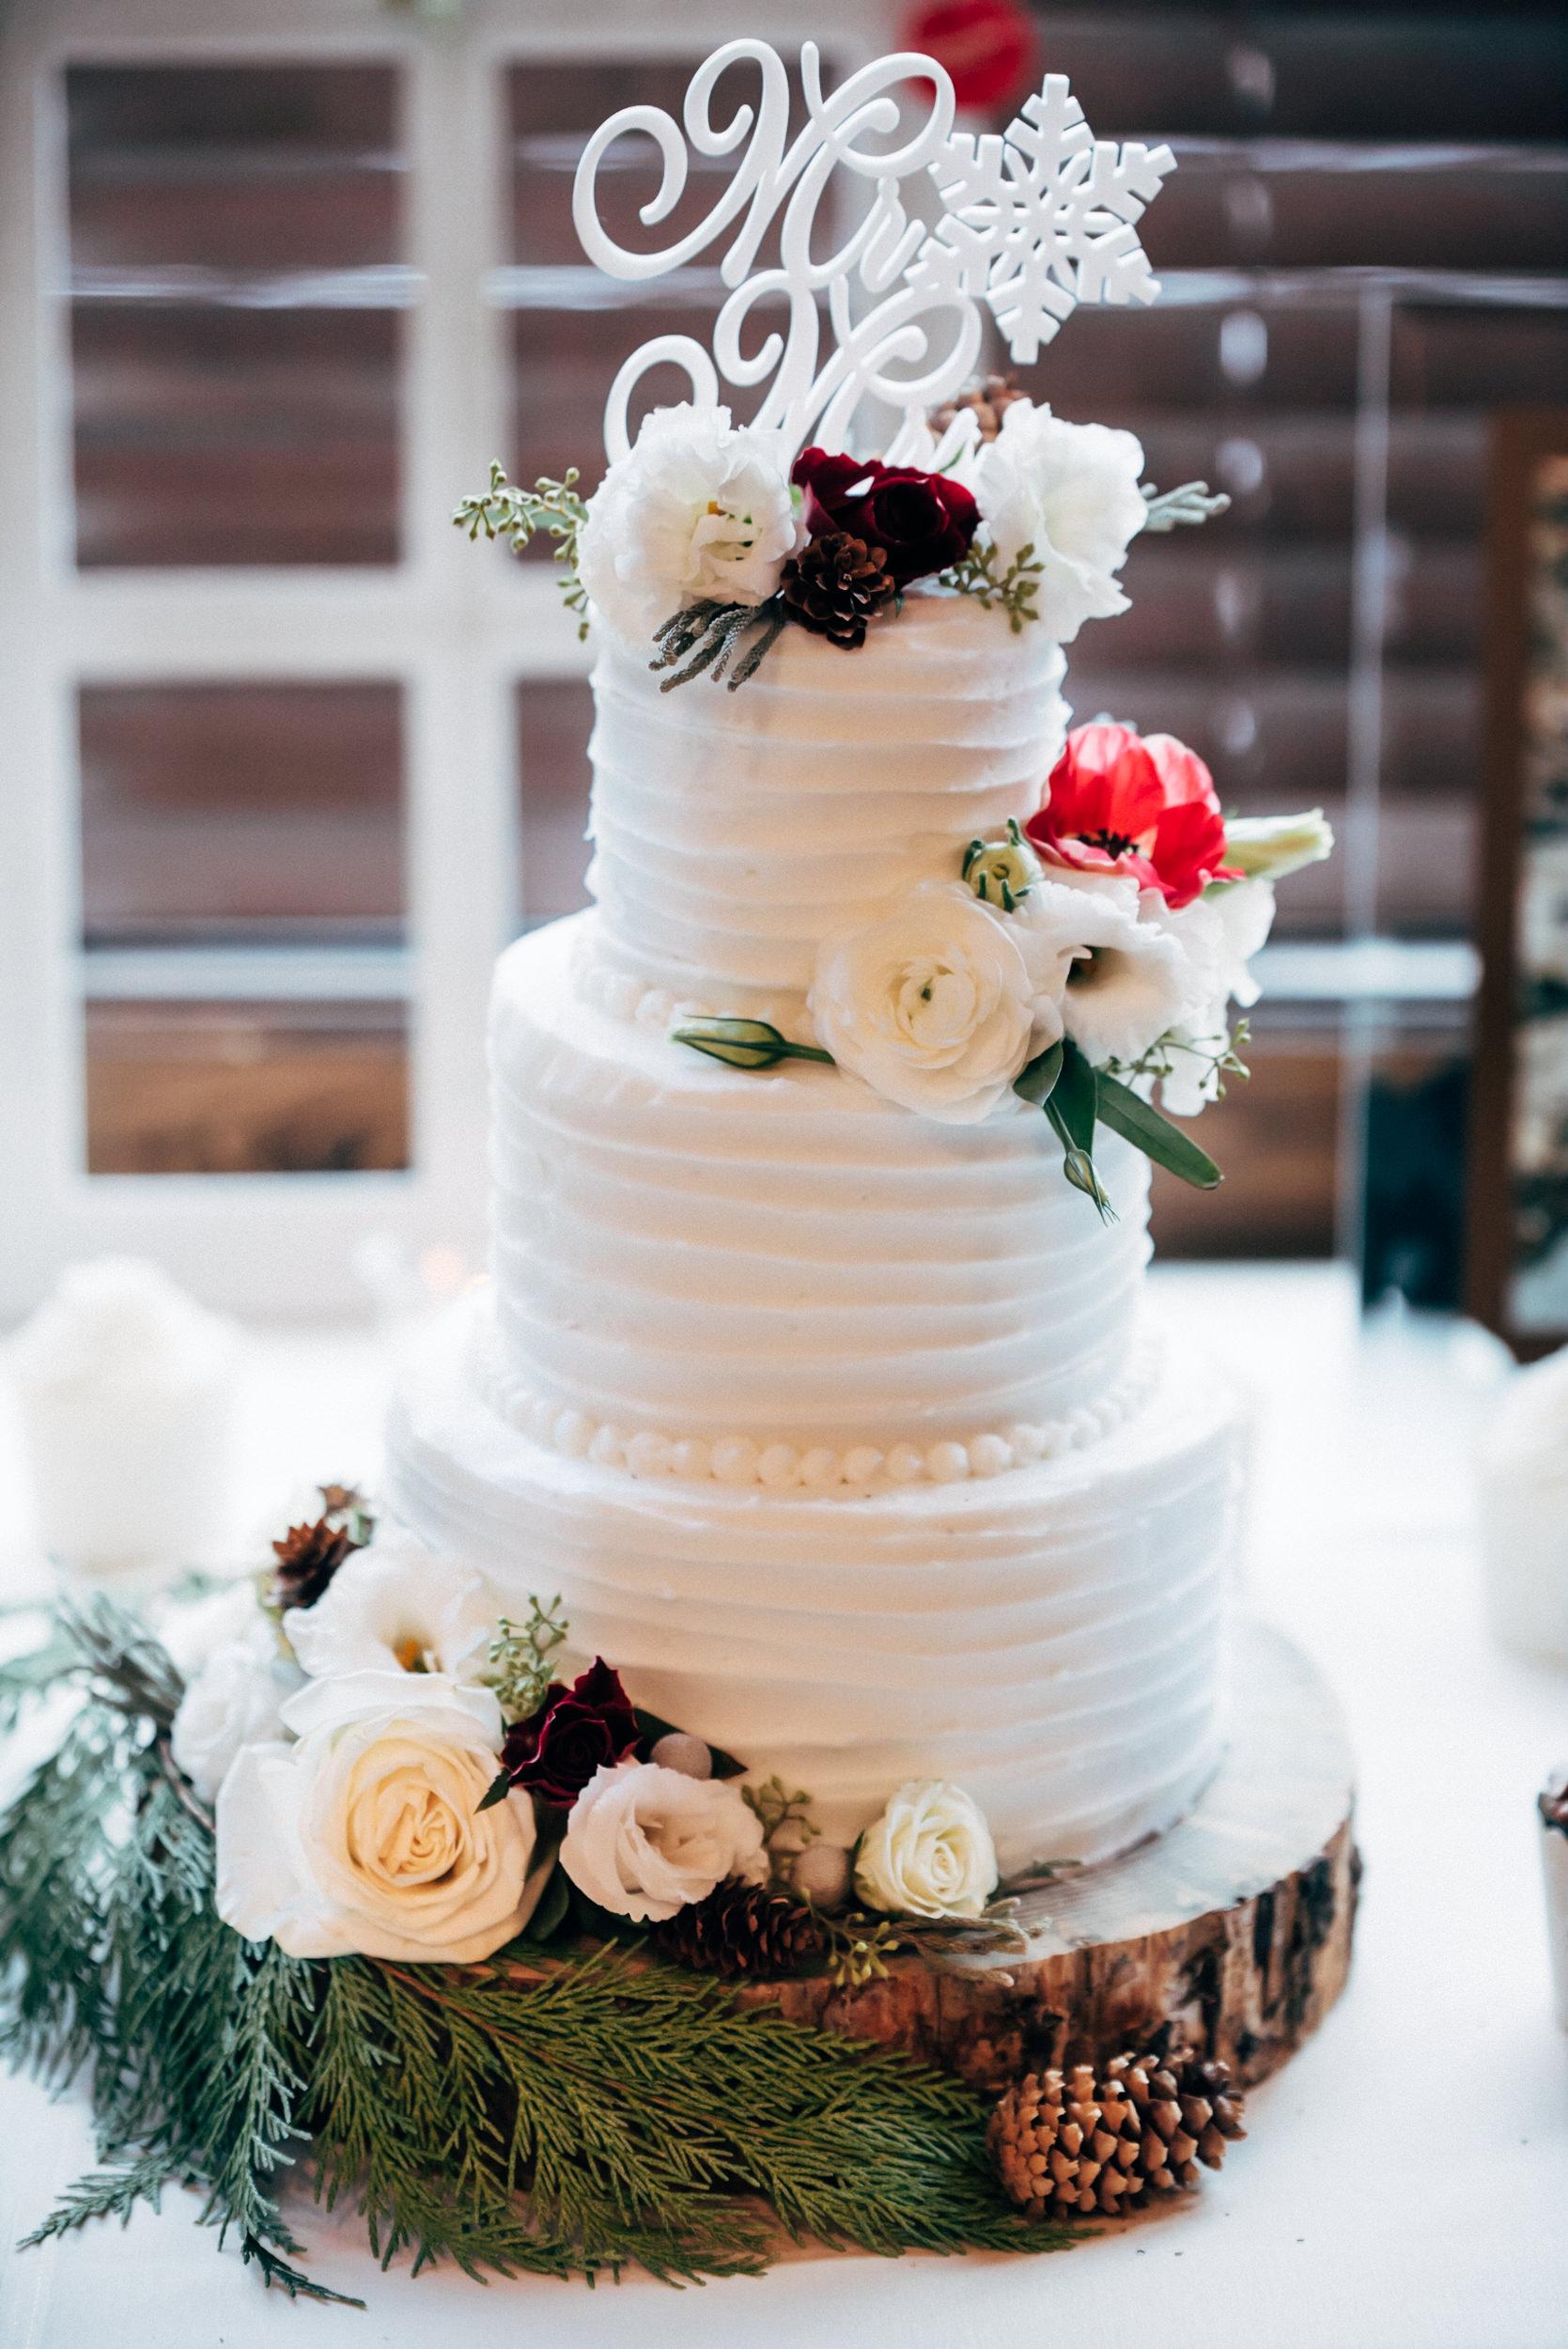 Colorado-Wedding-Photographer-Breckinridge-Mountain-Adventure-Elopement-66.jpg